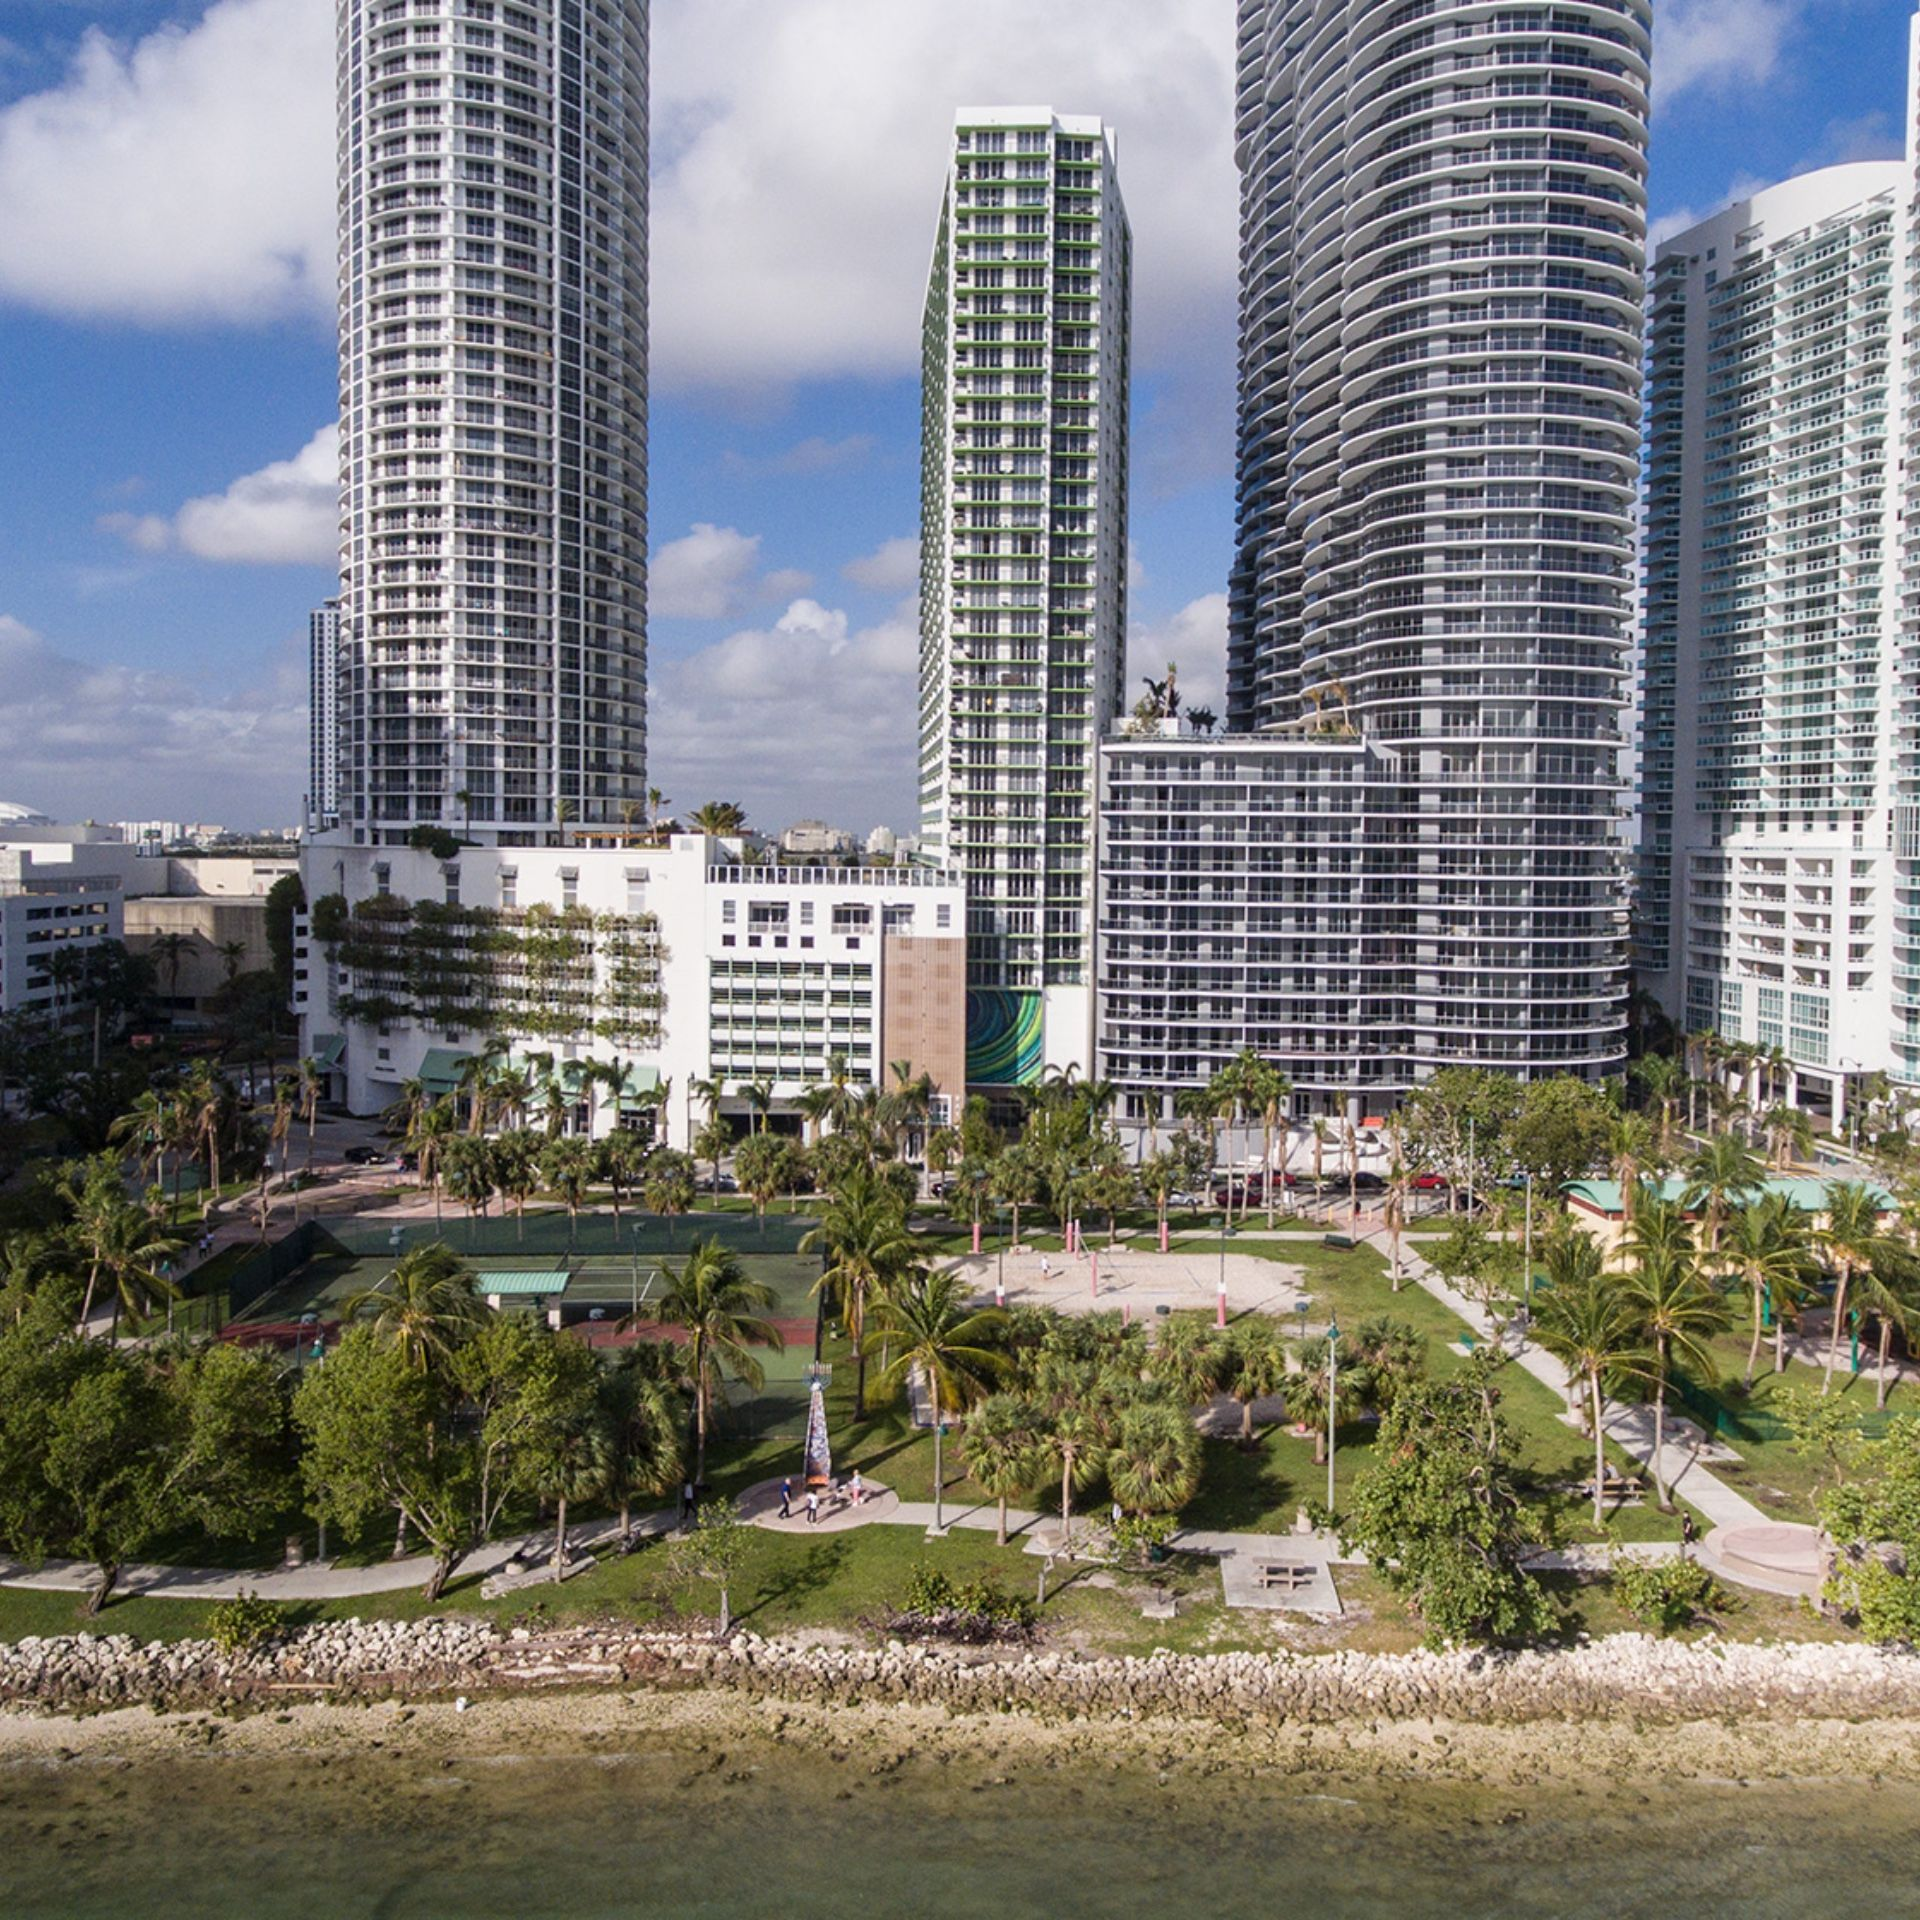 Bay parc miami florida florida hotels pets